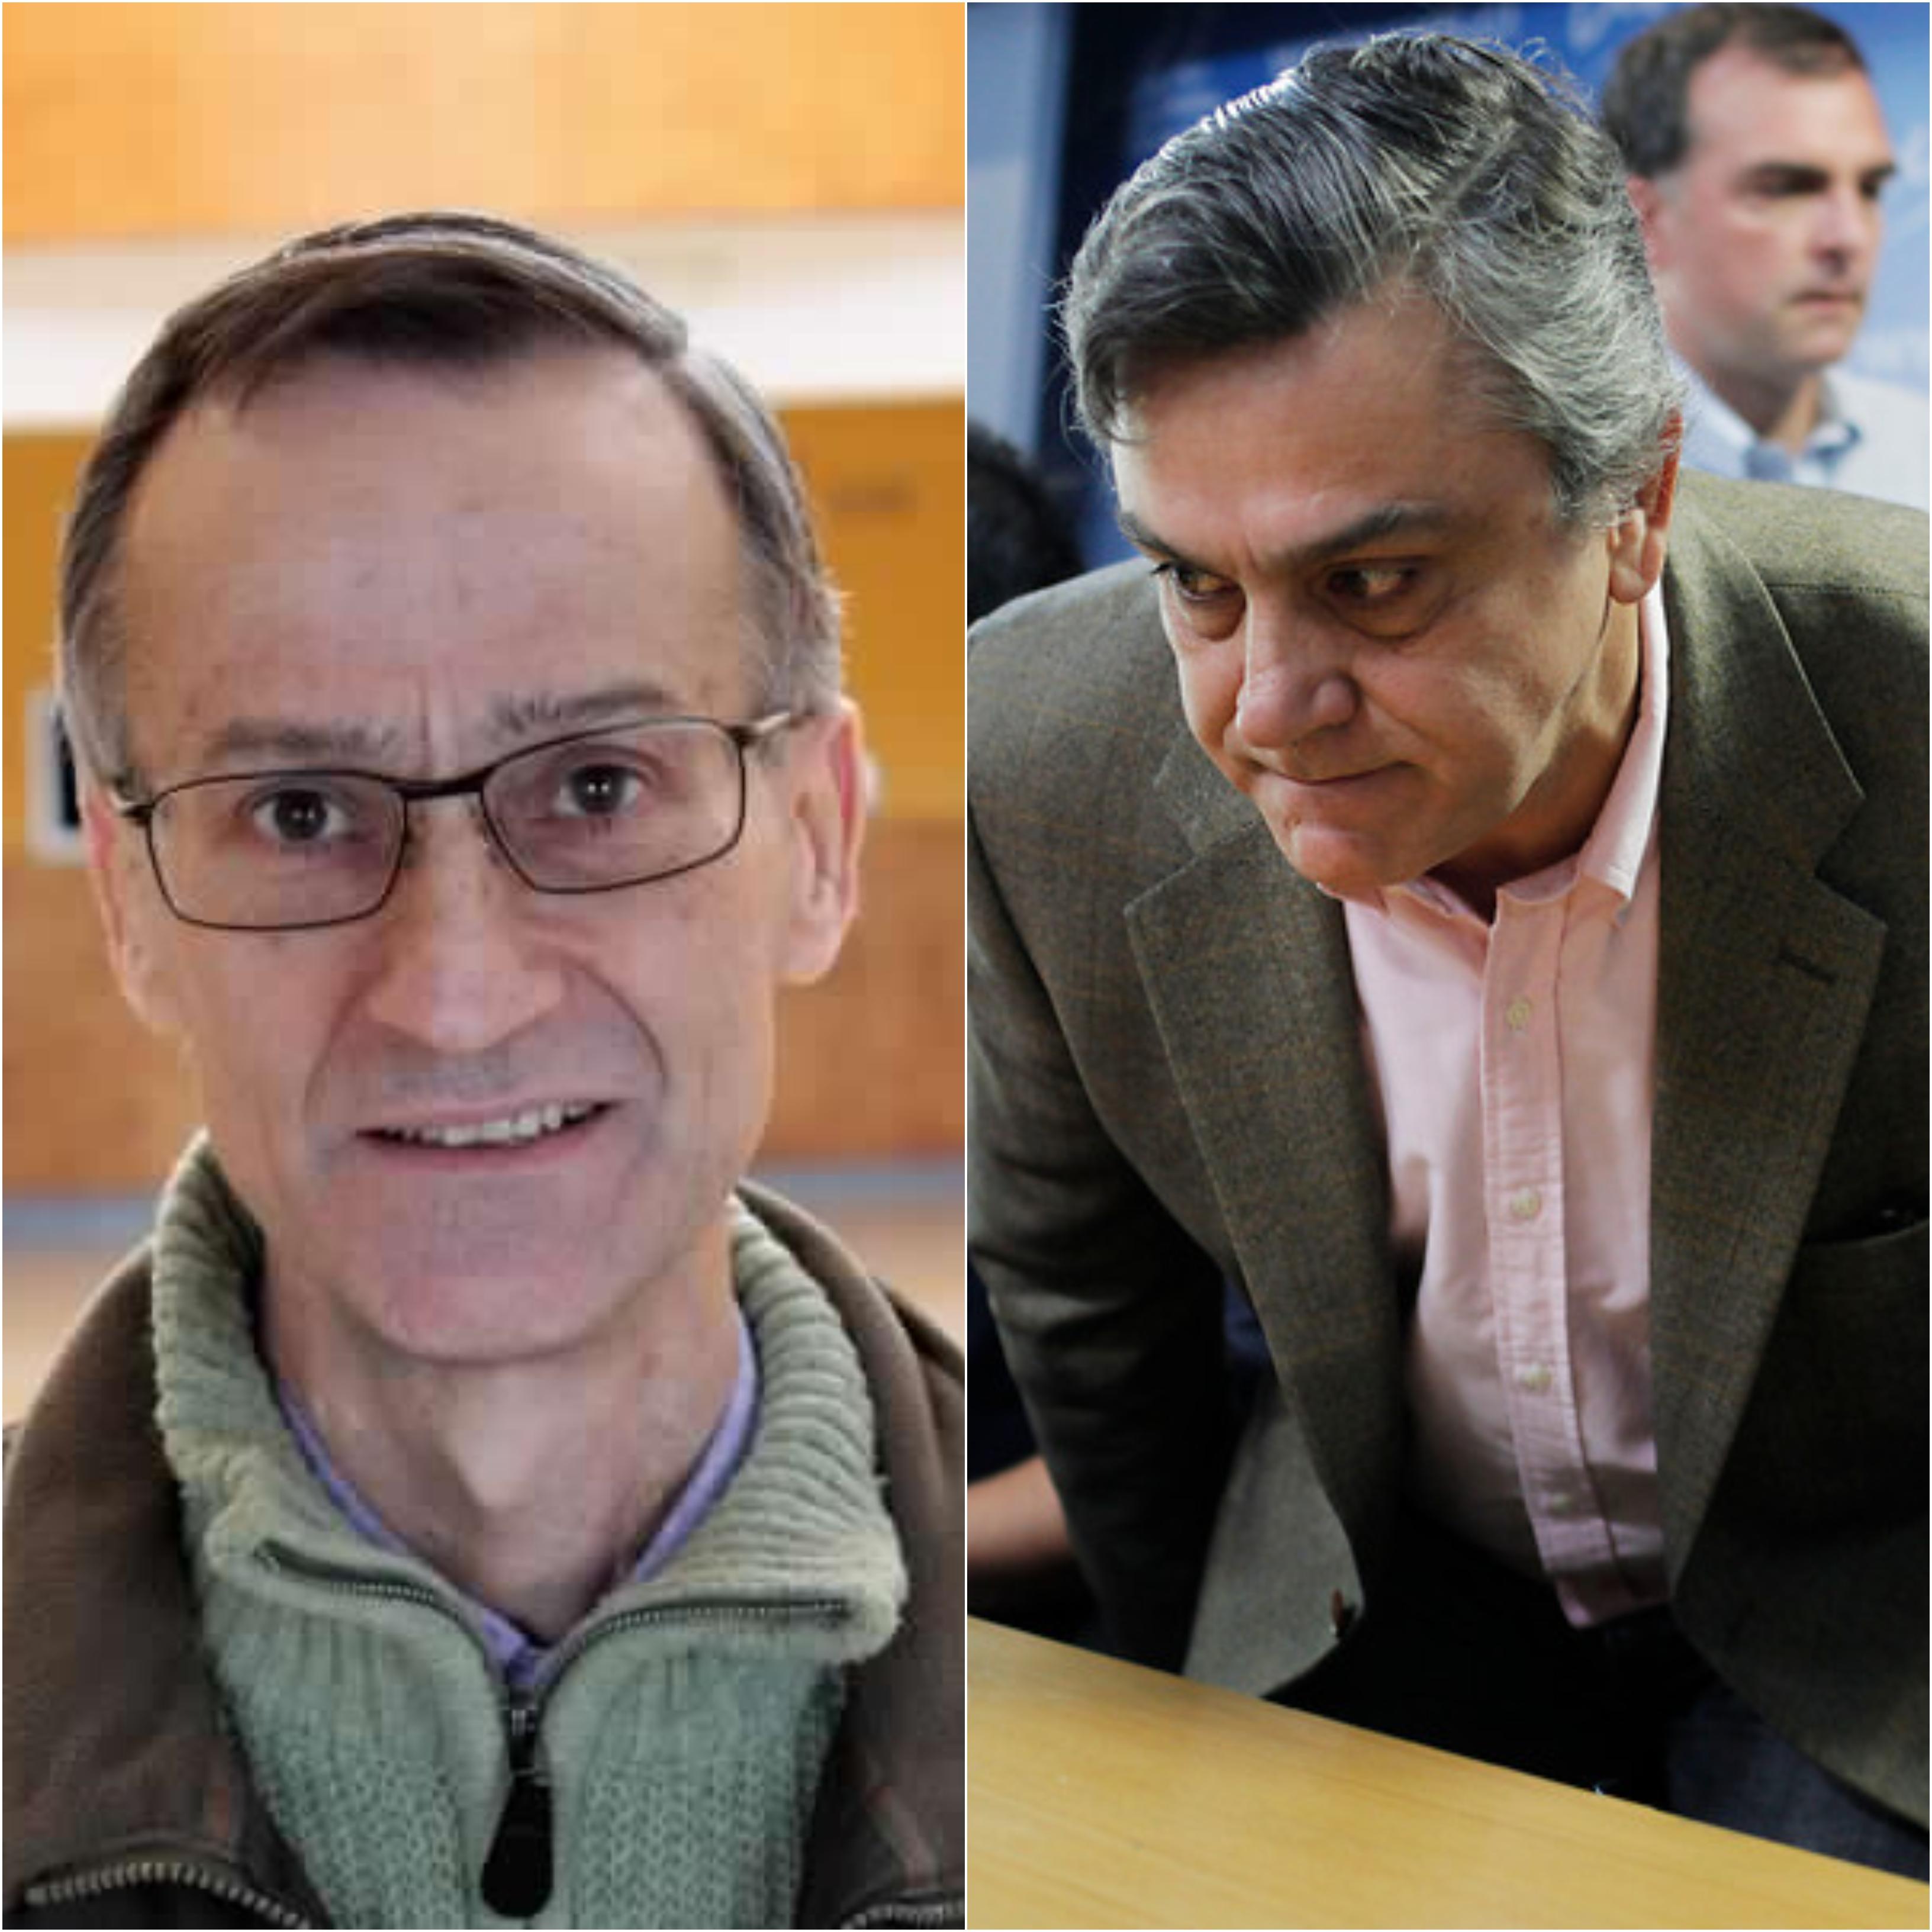 Iglesia desestima denuncia de abuso sexual contra cura Alejandro Longueira (hermano de Pablo Longueira)